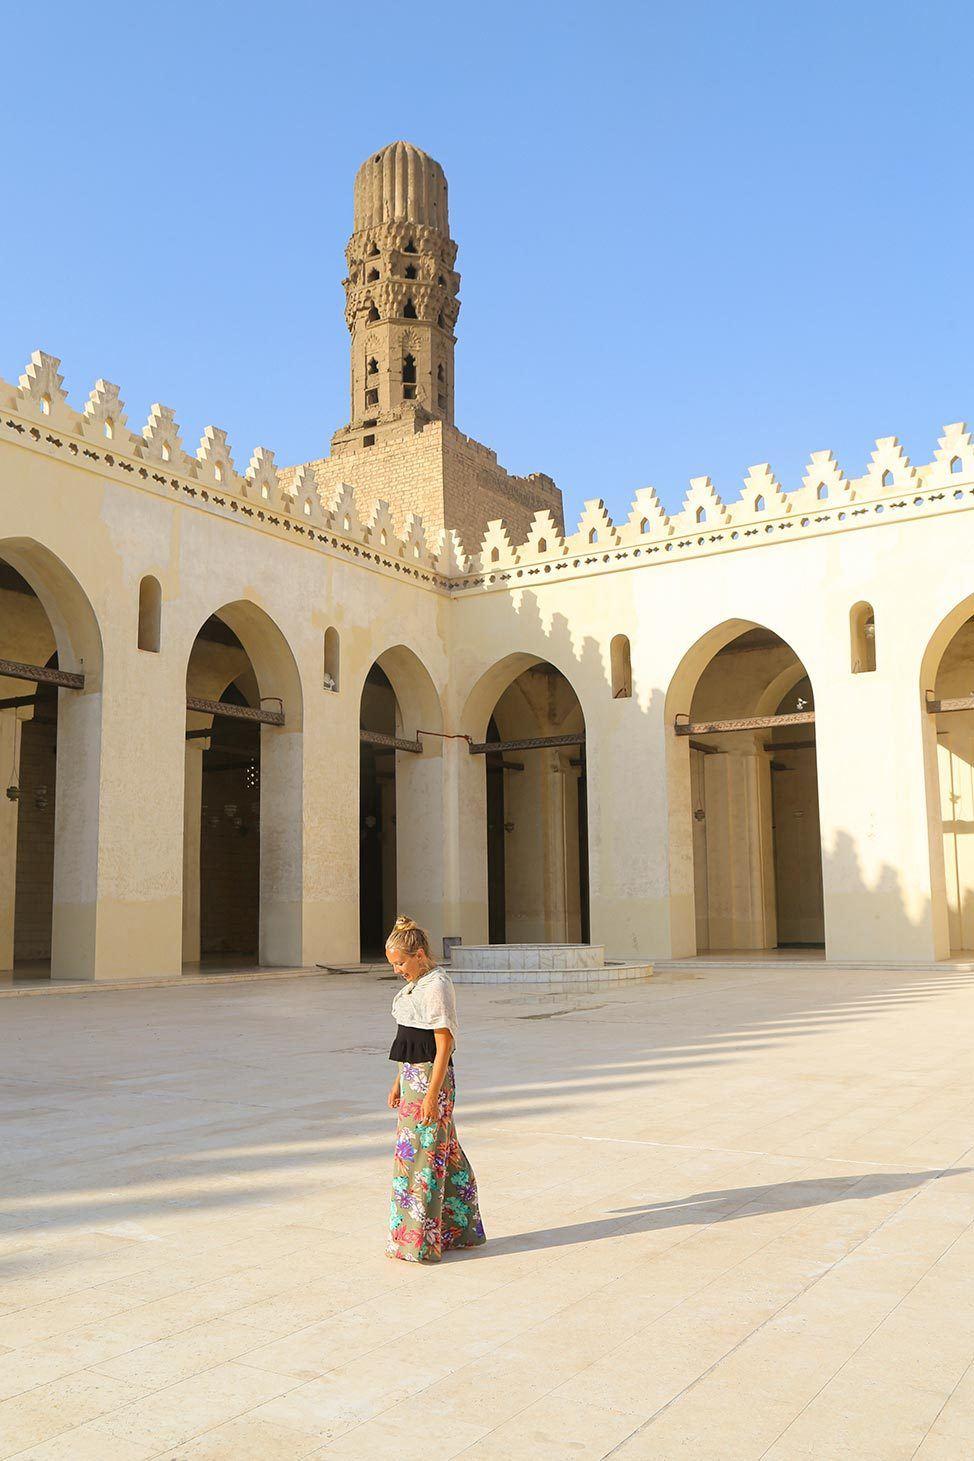 Islamic Mosque in Cairo